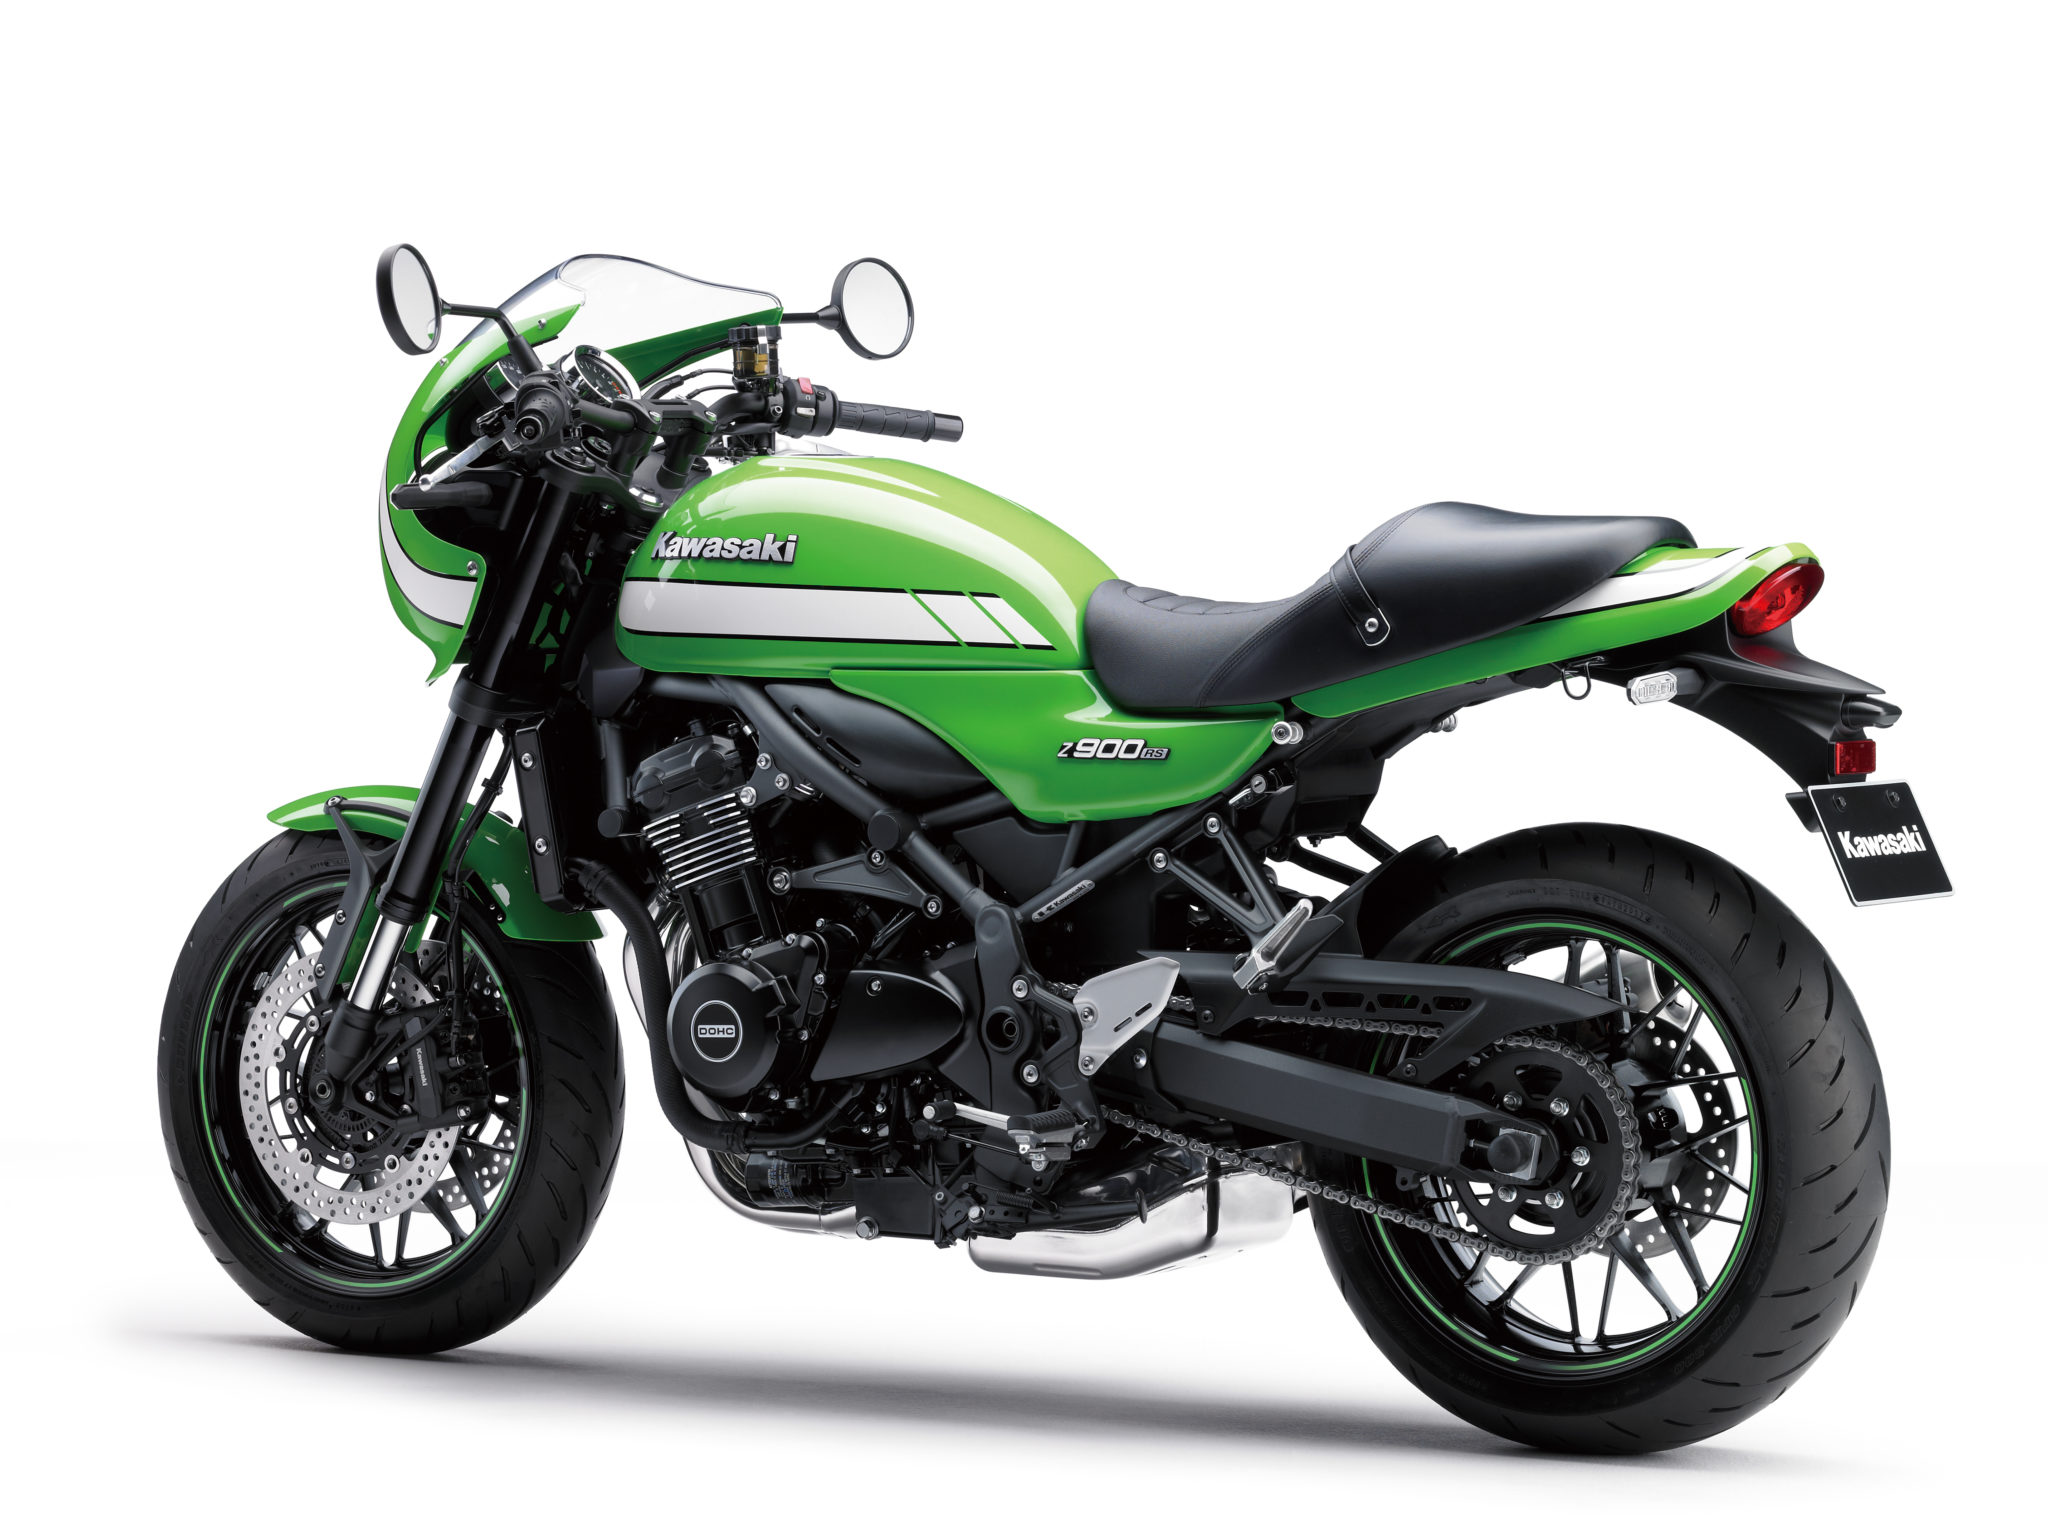 Motorbike types, Cafe Racer, Kawasaki Z900